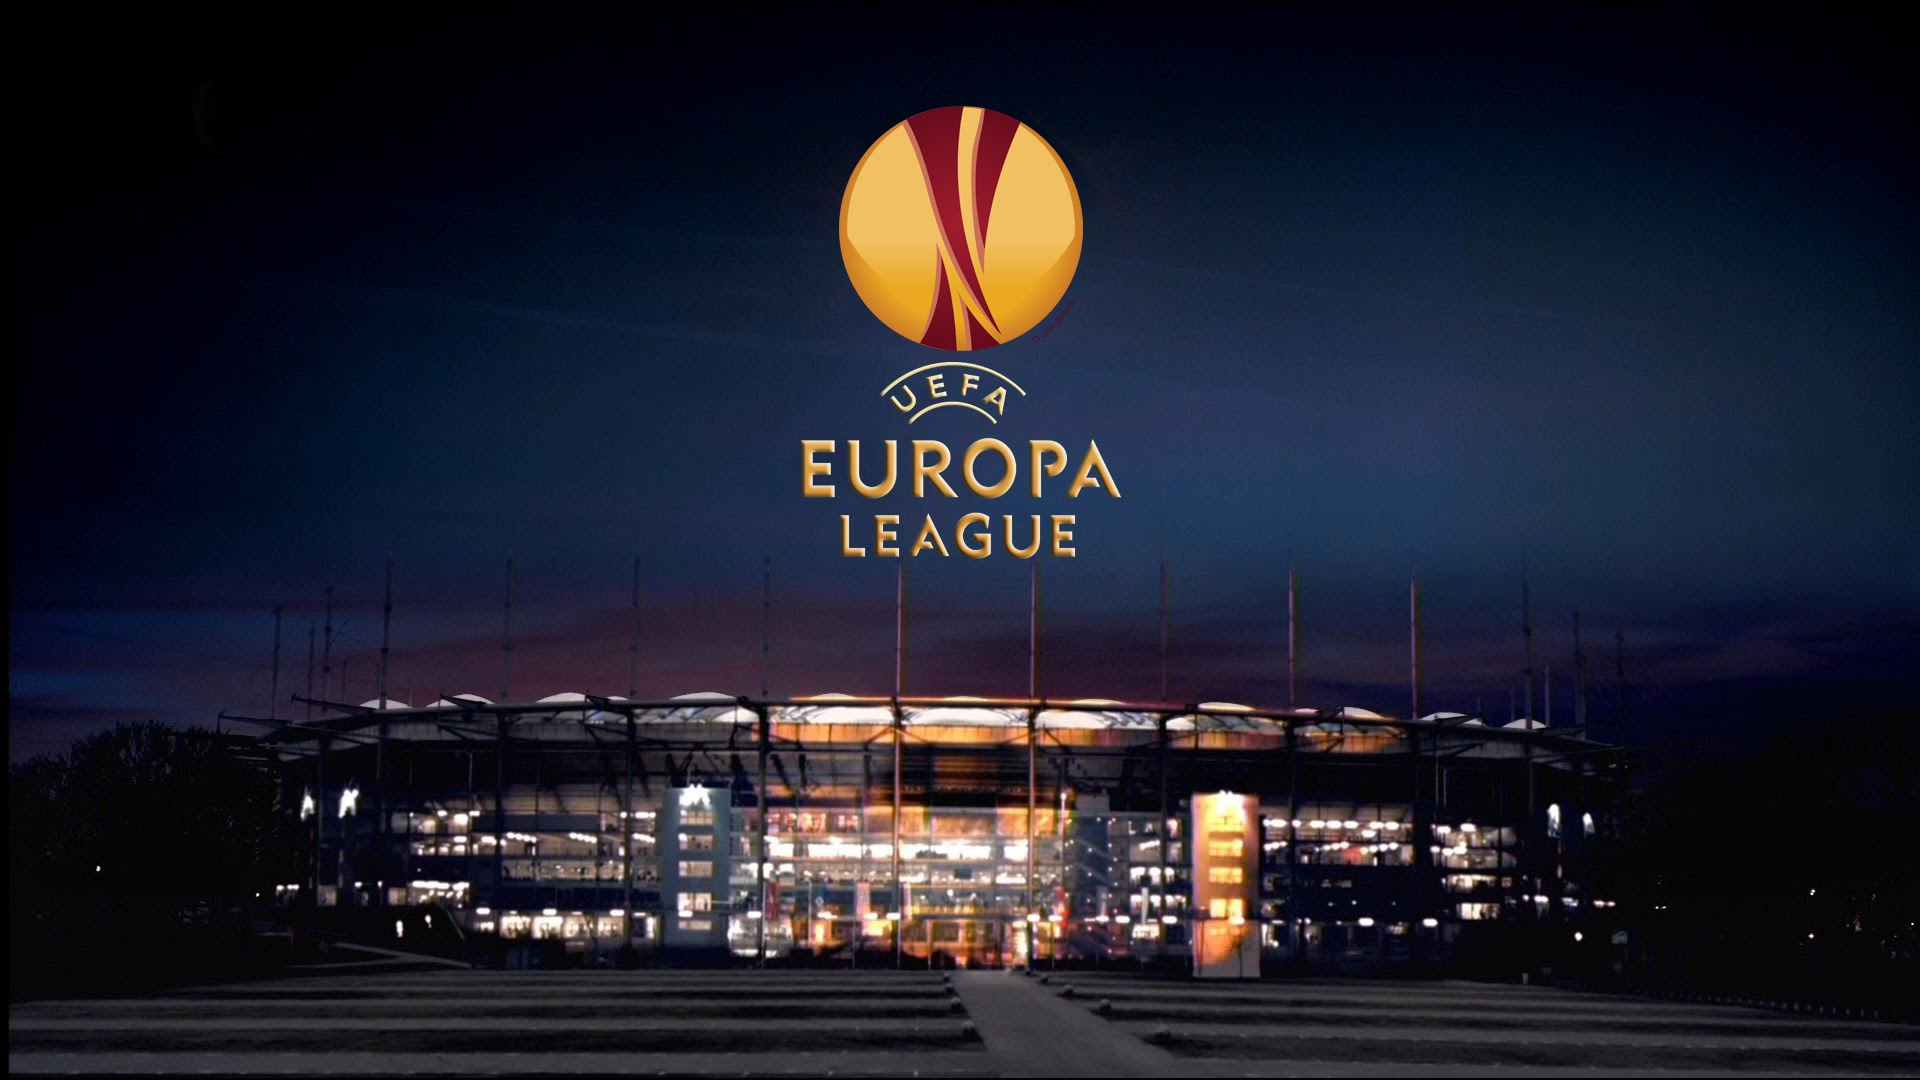 europa league - photo #10